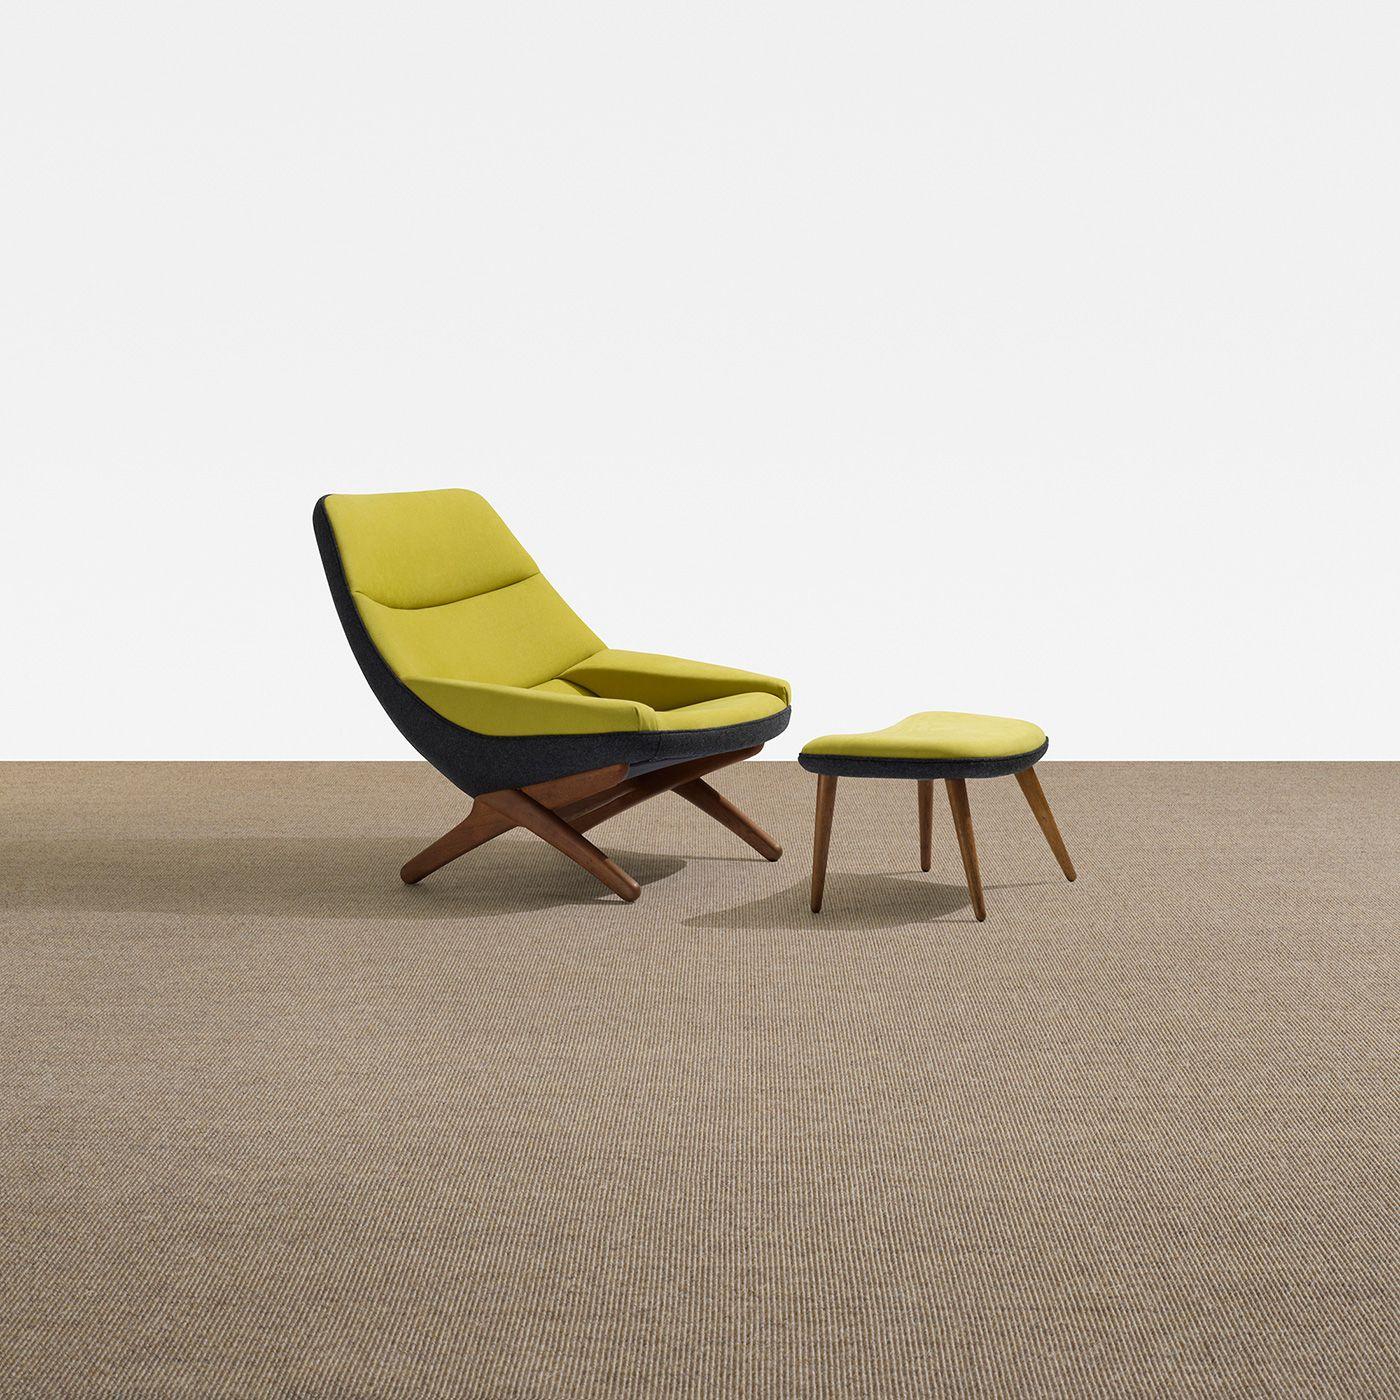 Marvelous Illum Wikkelsø / Lounge Chair And Ottoman , Scandinavian Design.